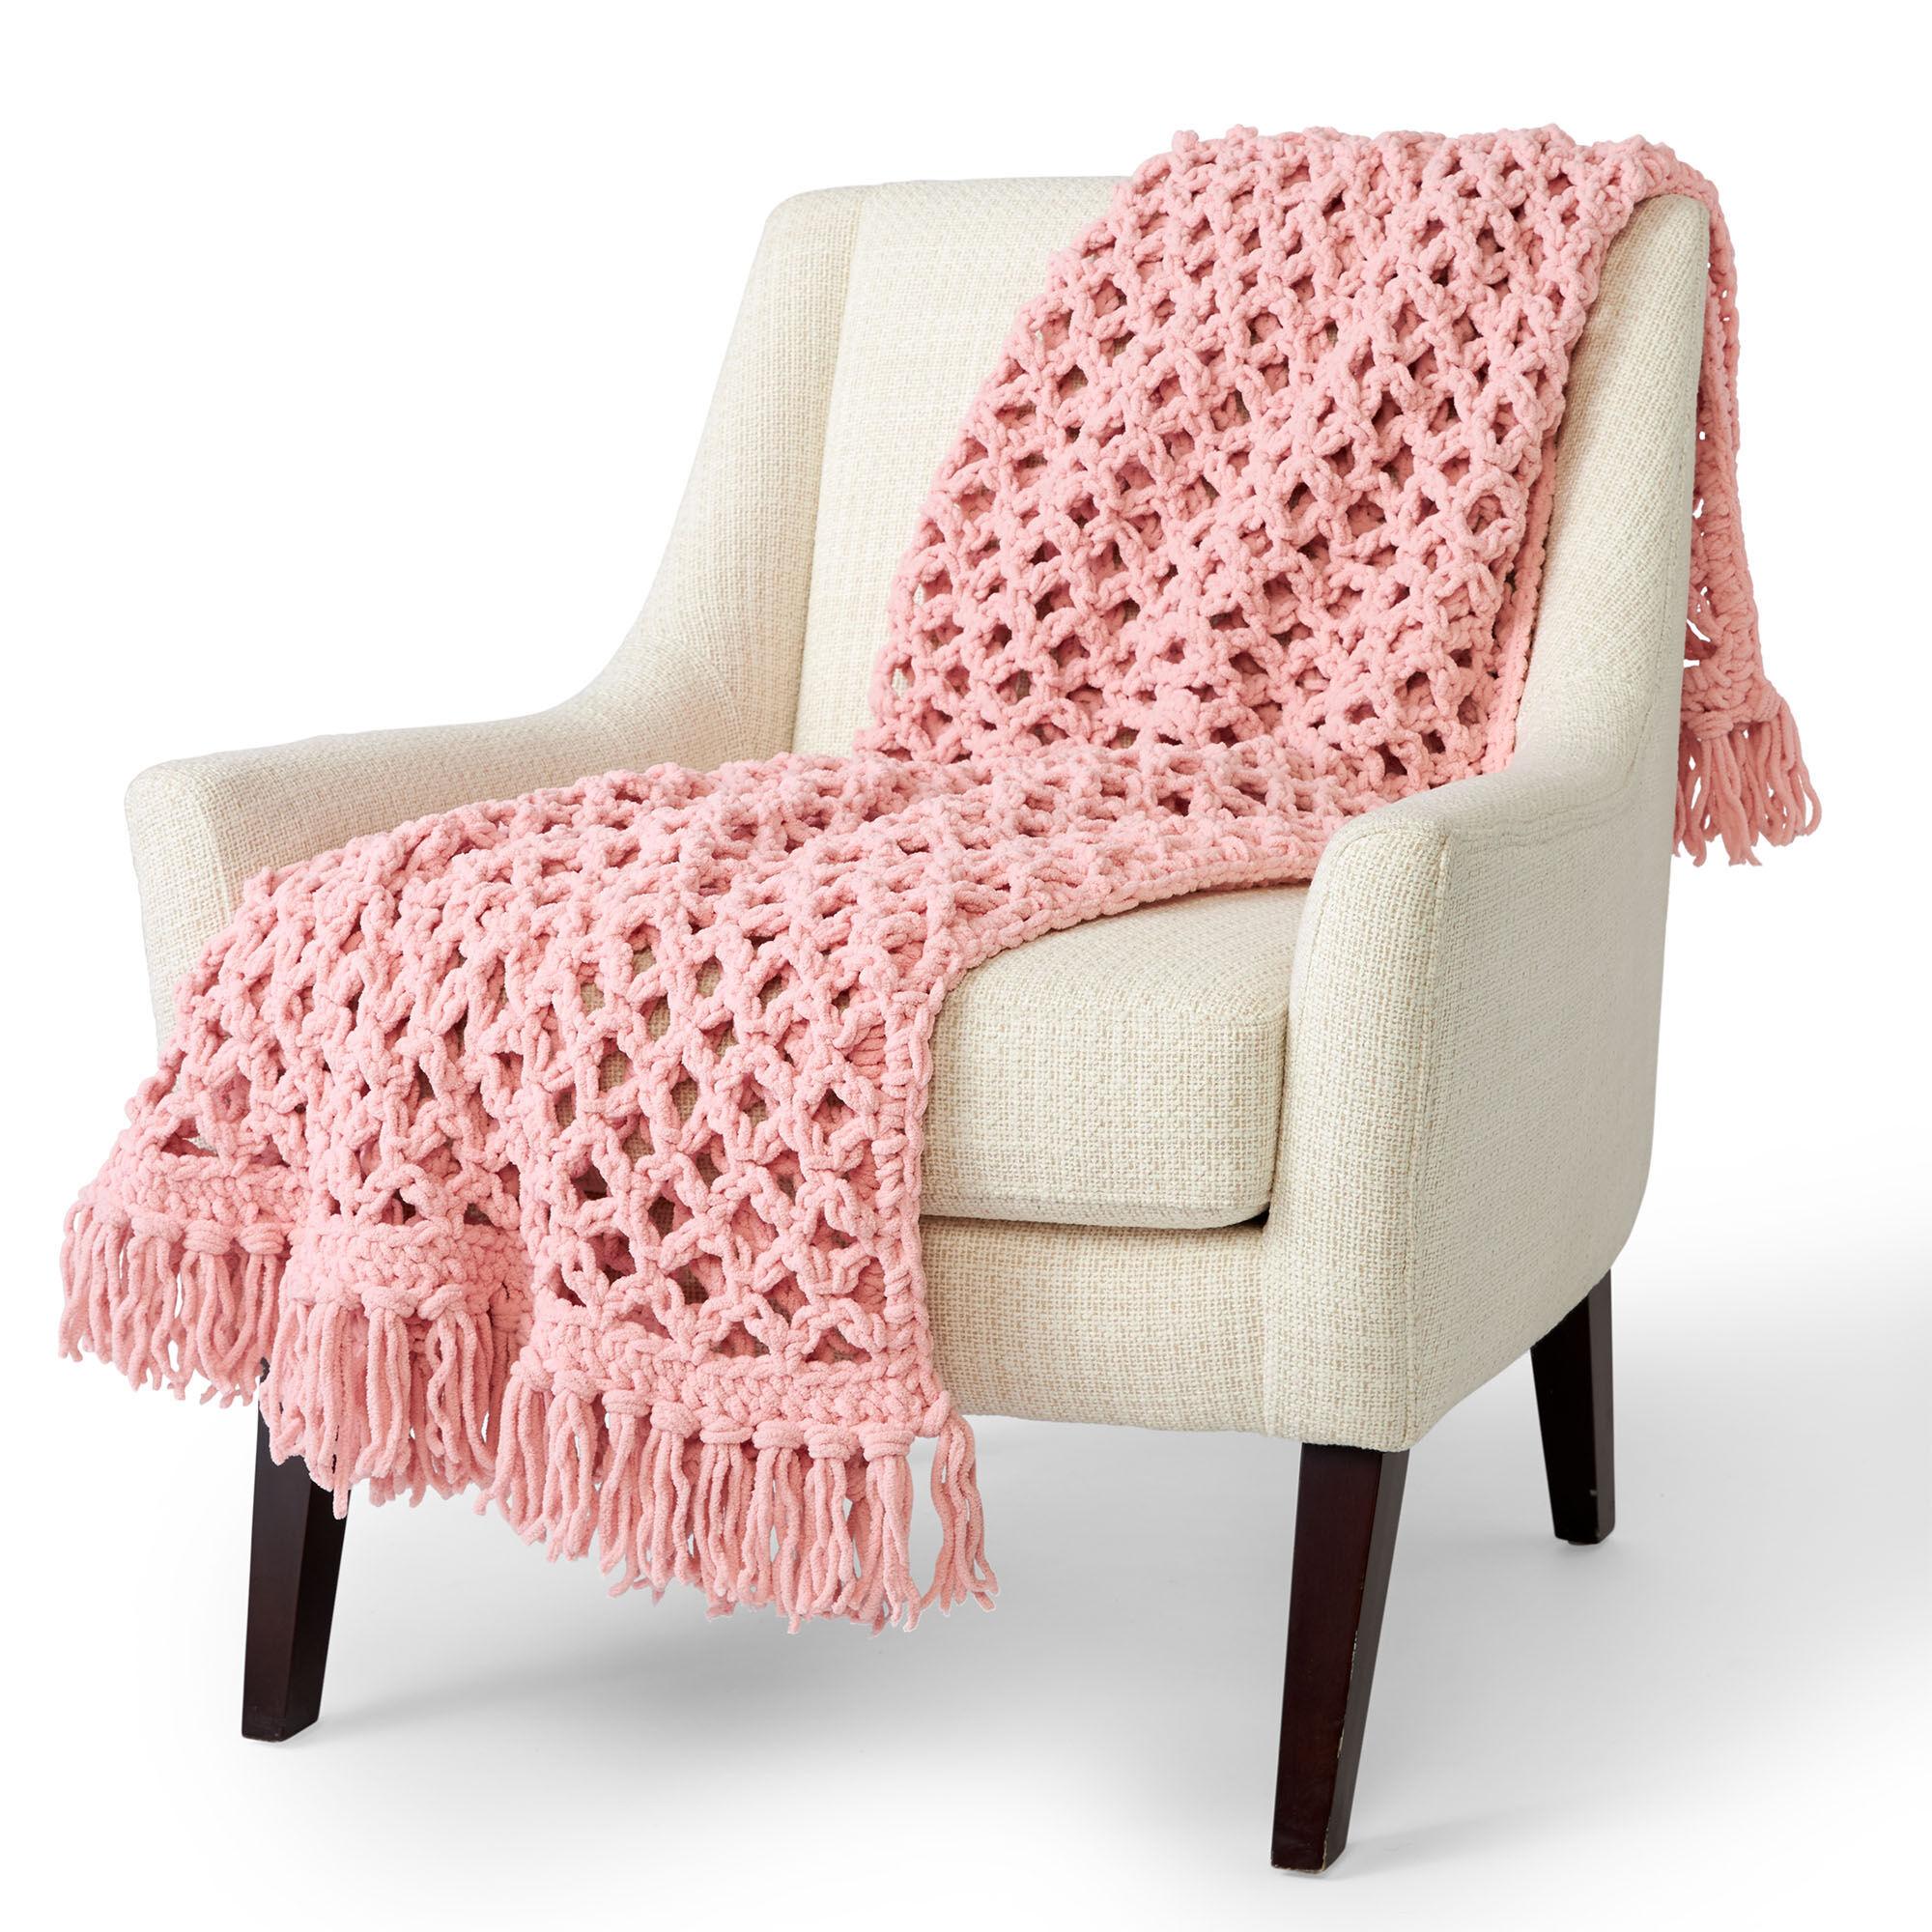 Bernat Love Knot Crcohet Blanket | Yarnspirations